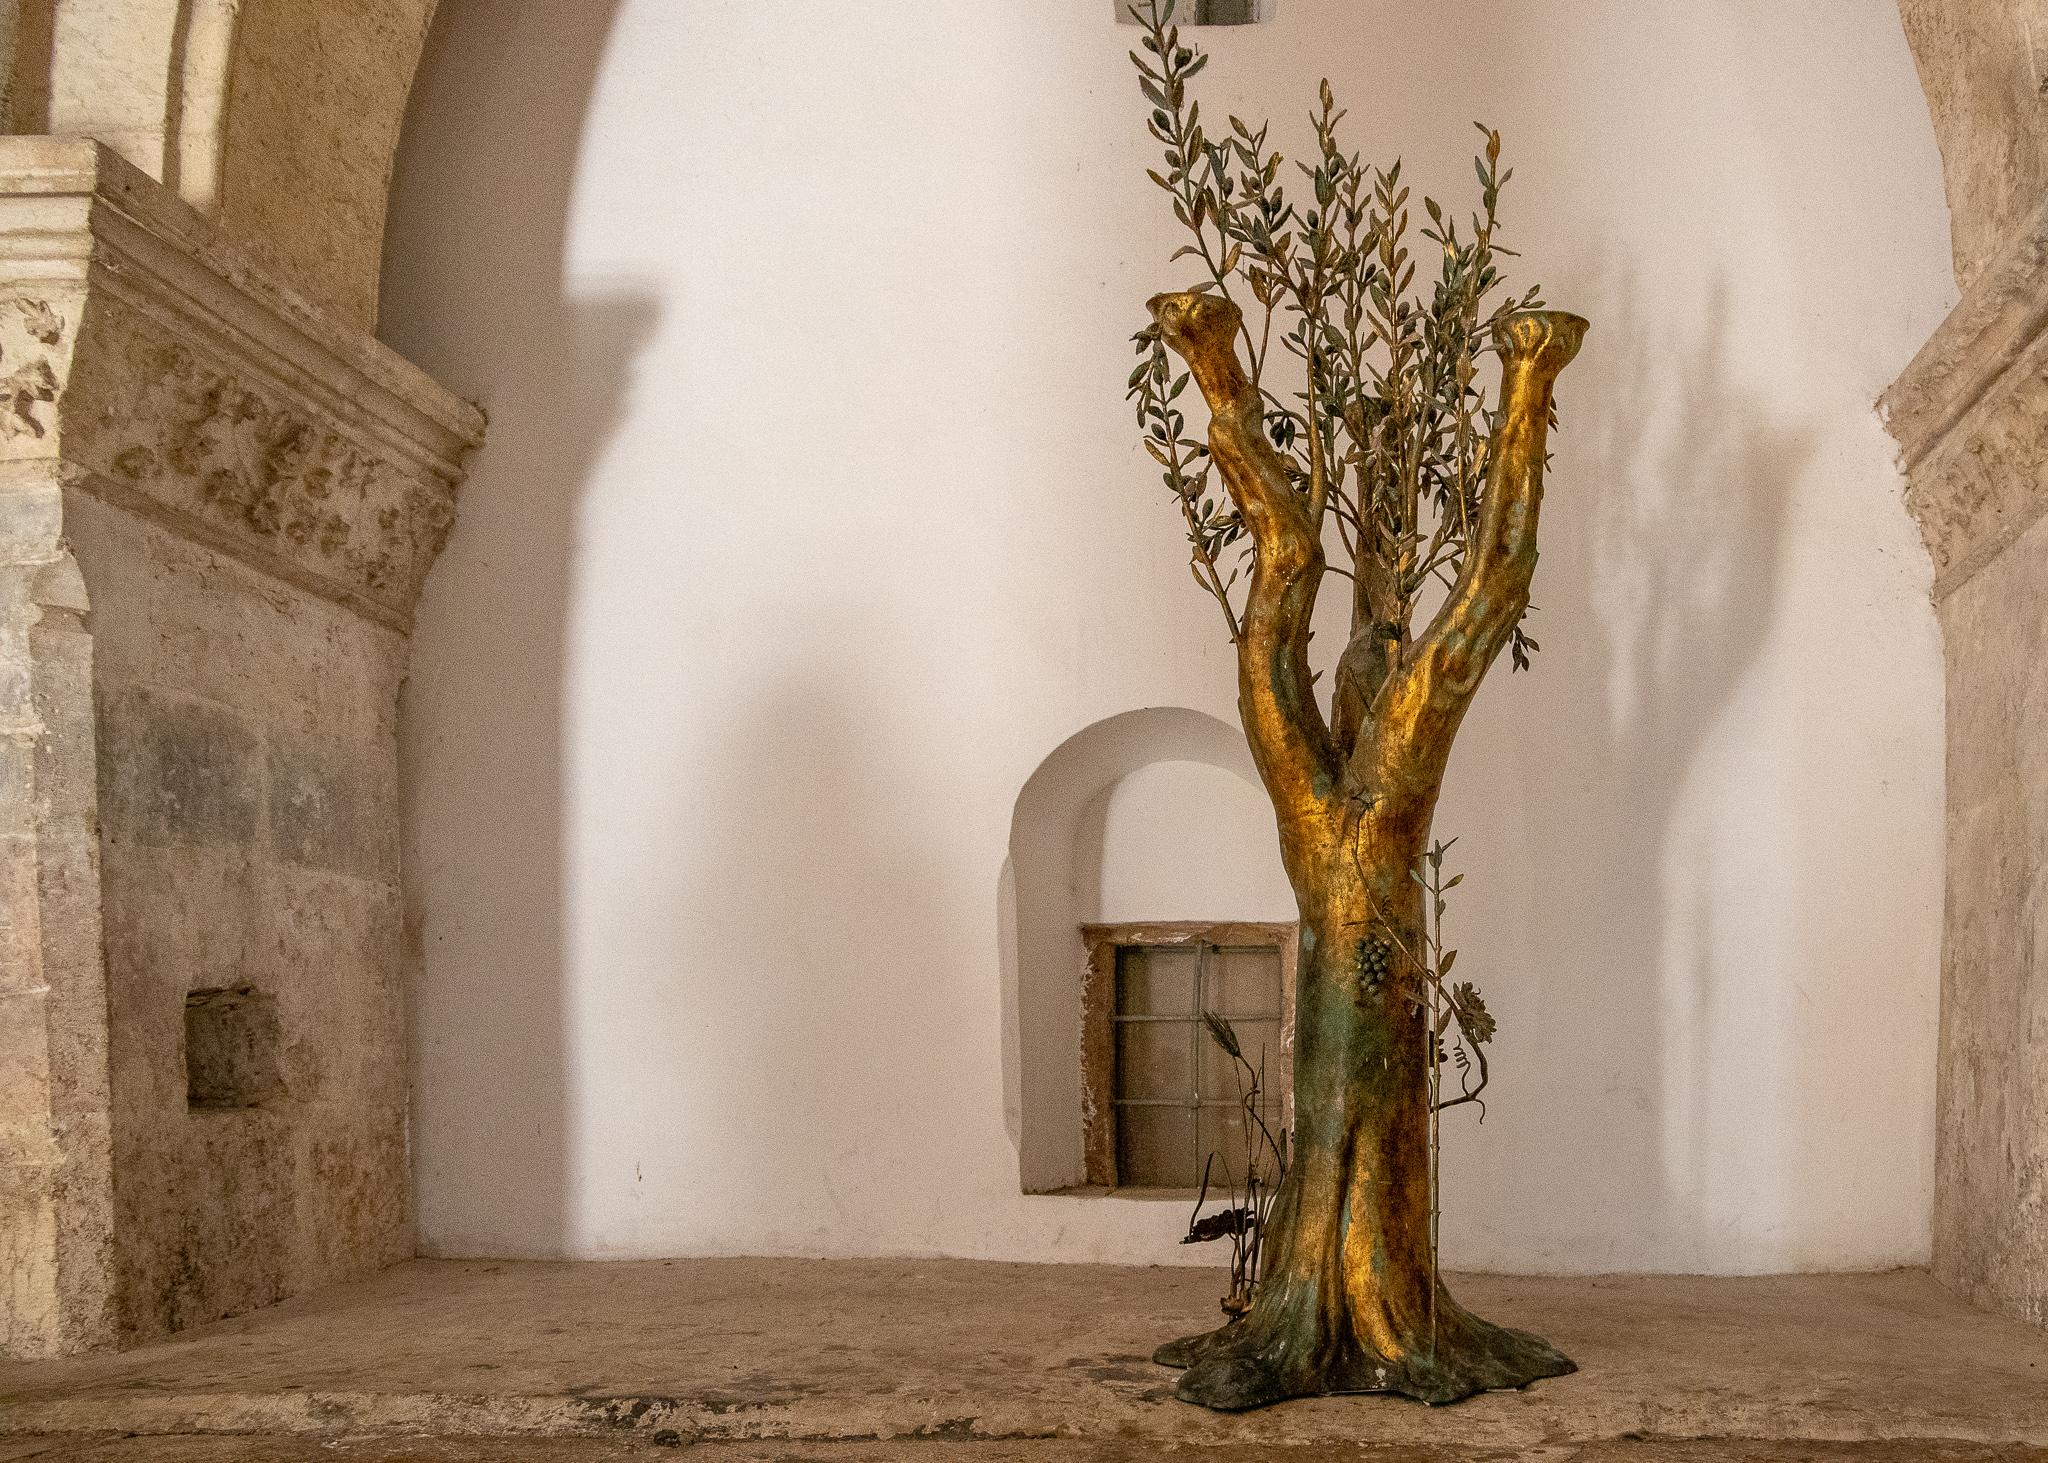 A bronze olive tree, hopefully symbolising future peace amongst the main Abrahamic religions